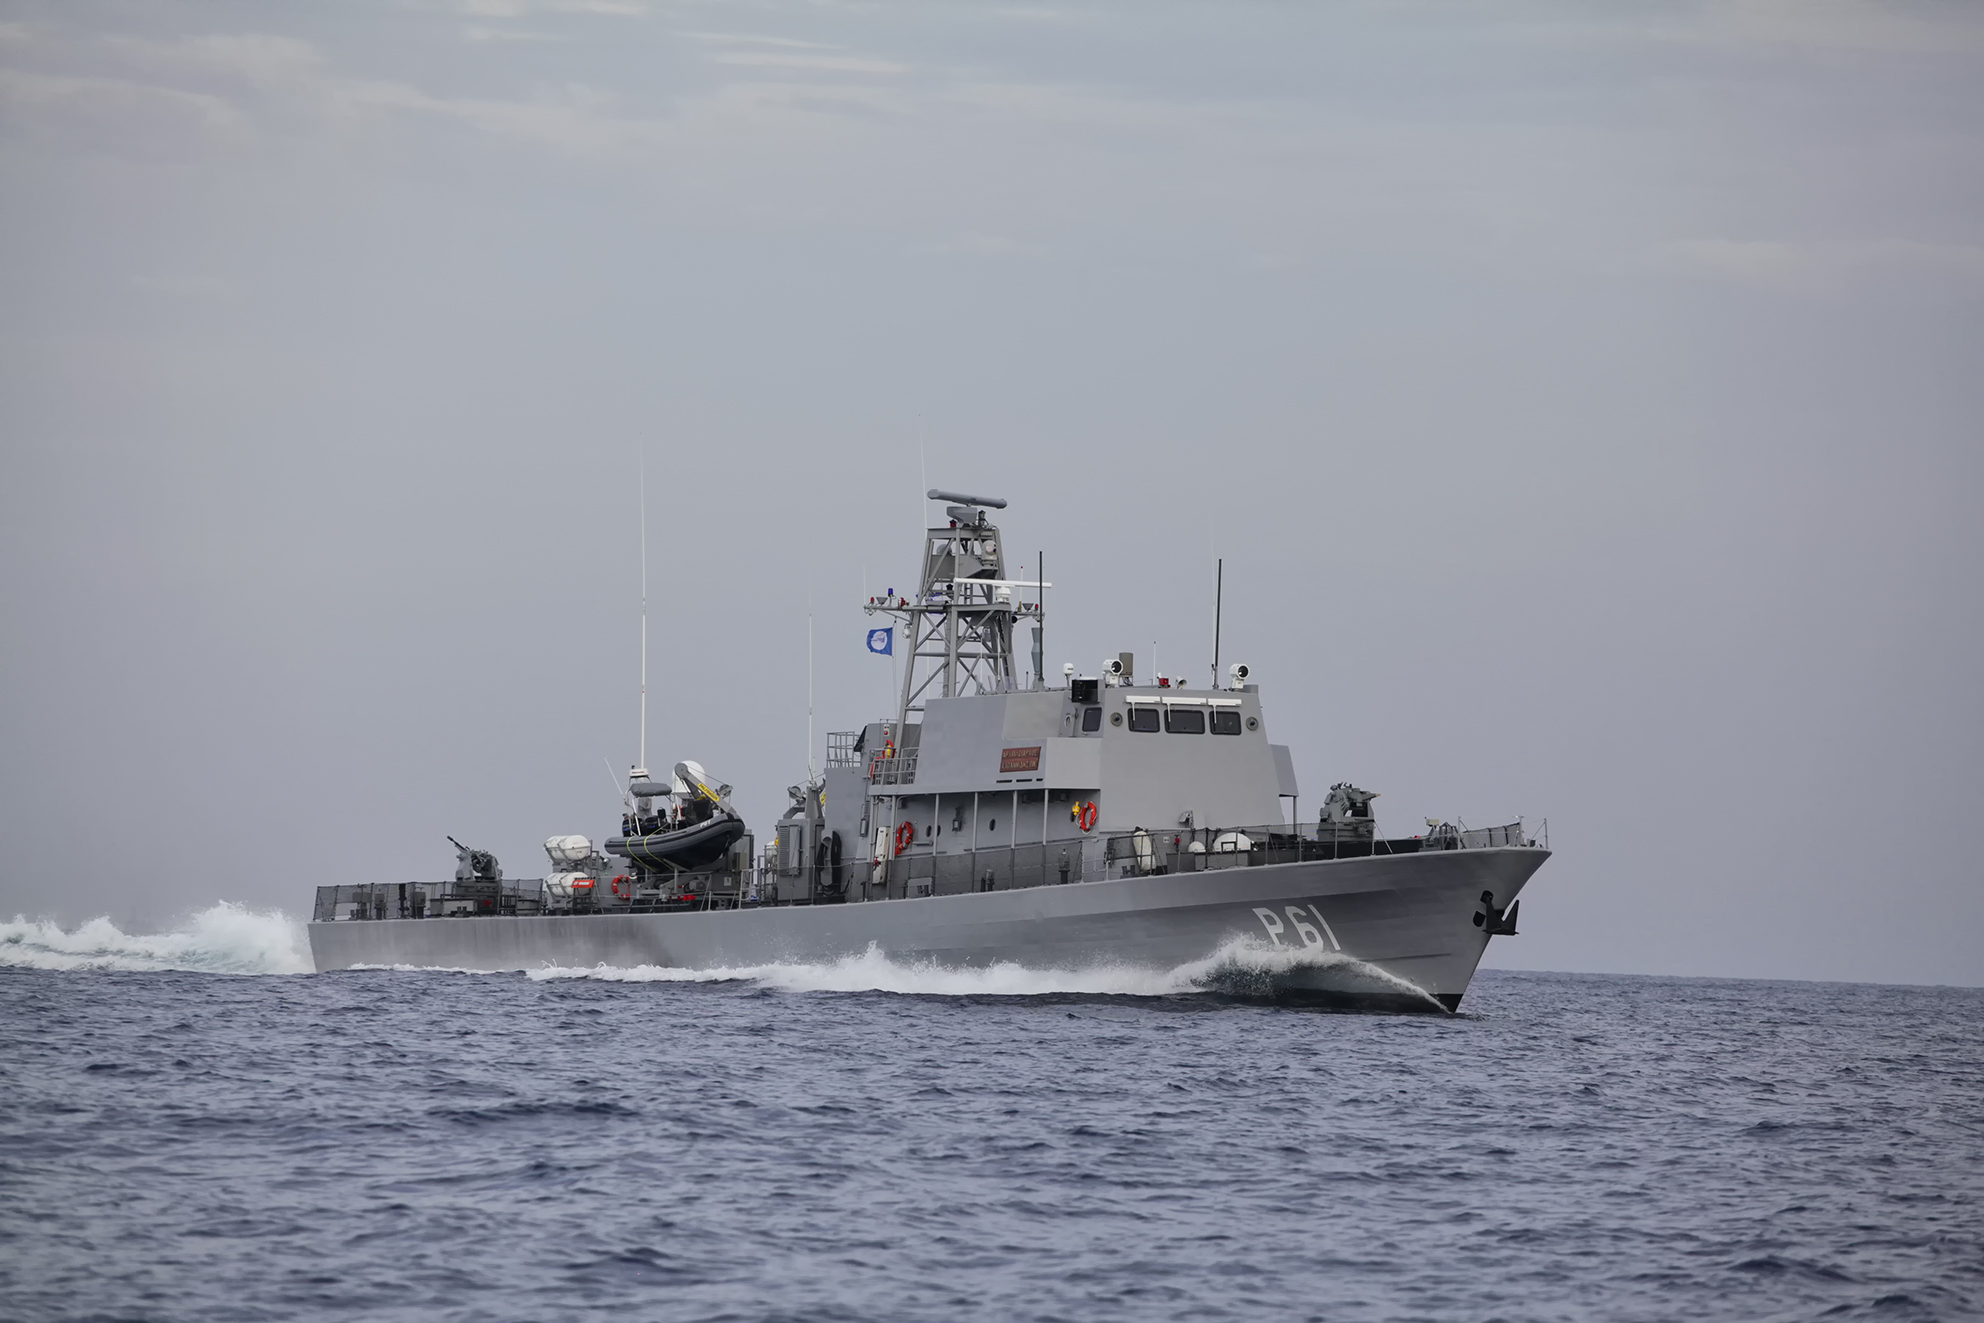 Israel Shipyards Introduces Coastal Defense Systems at